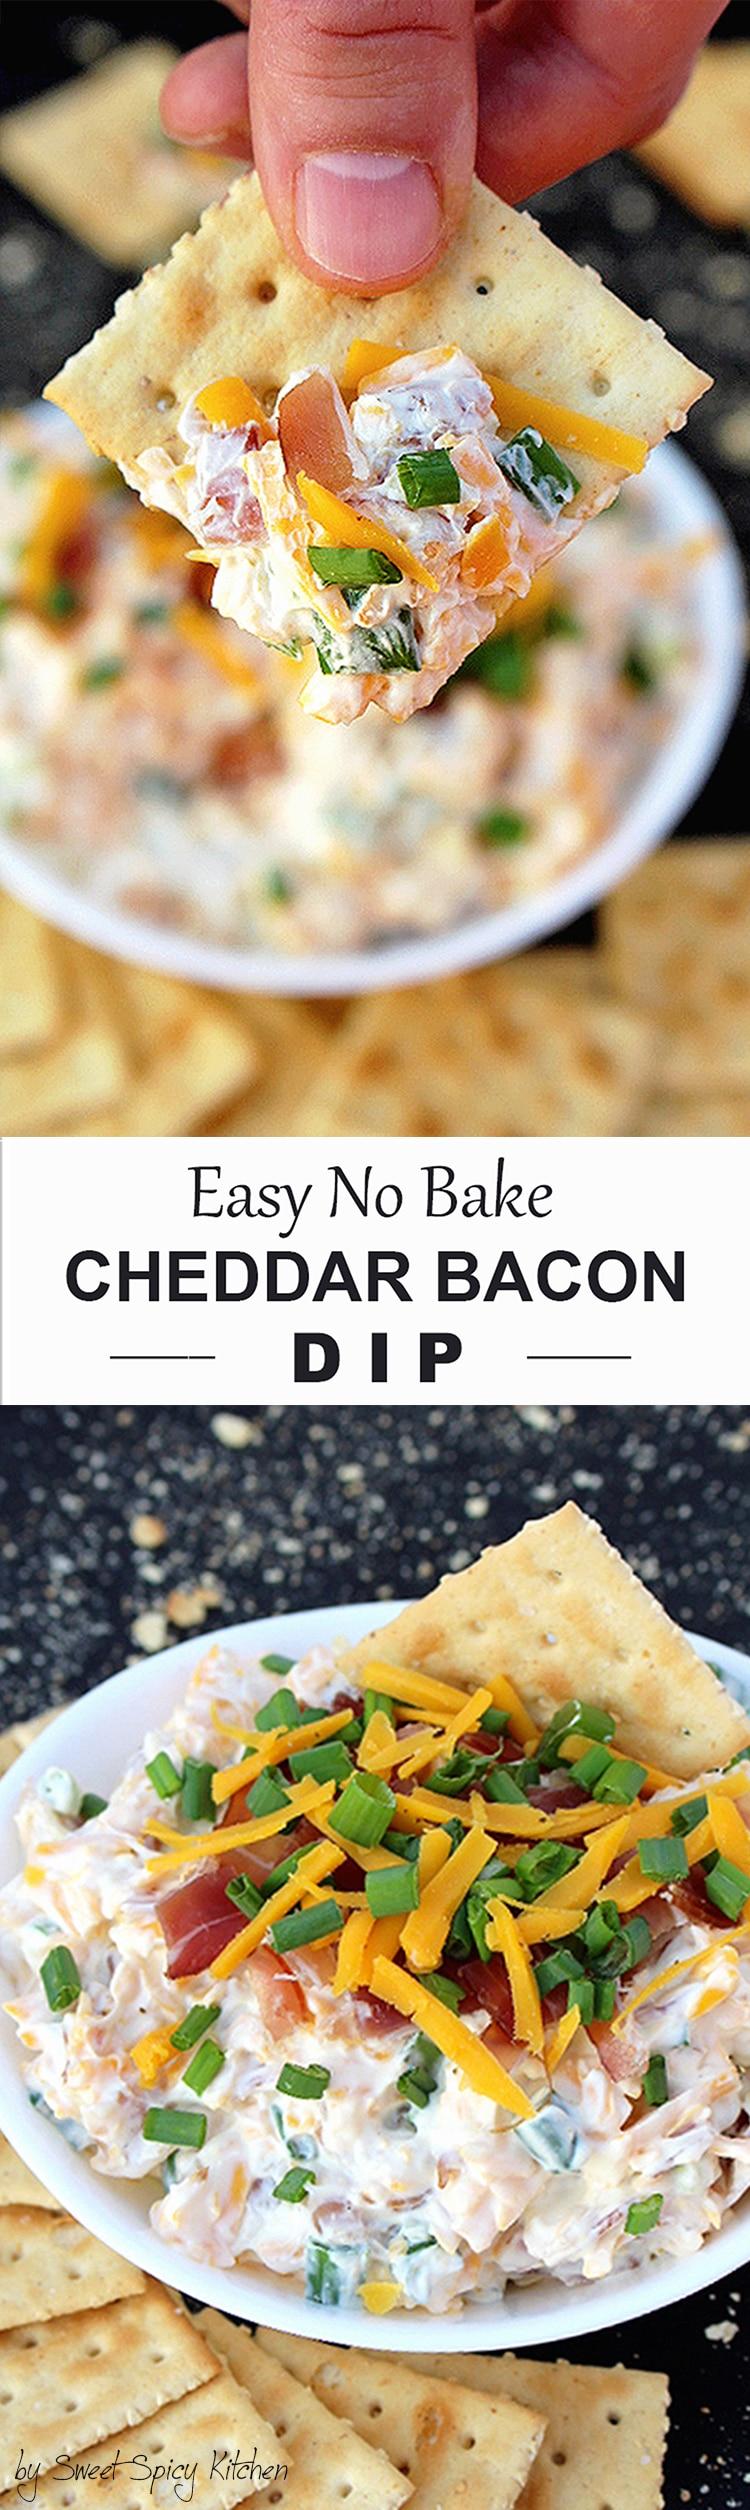 Untitled-13111 No Bake Cheddar Bacon Dip